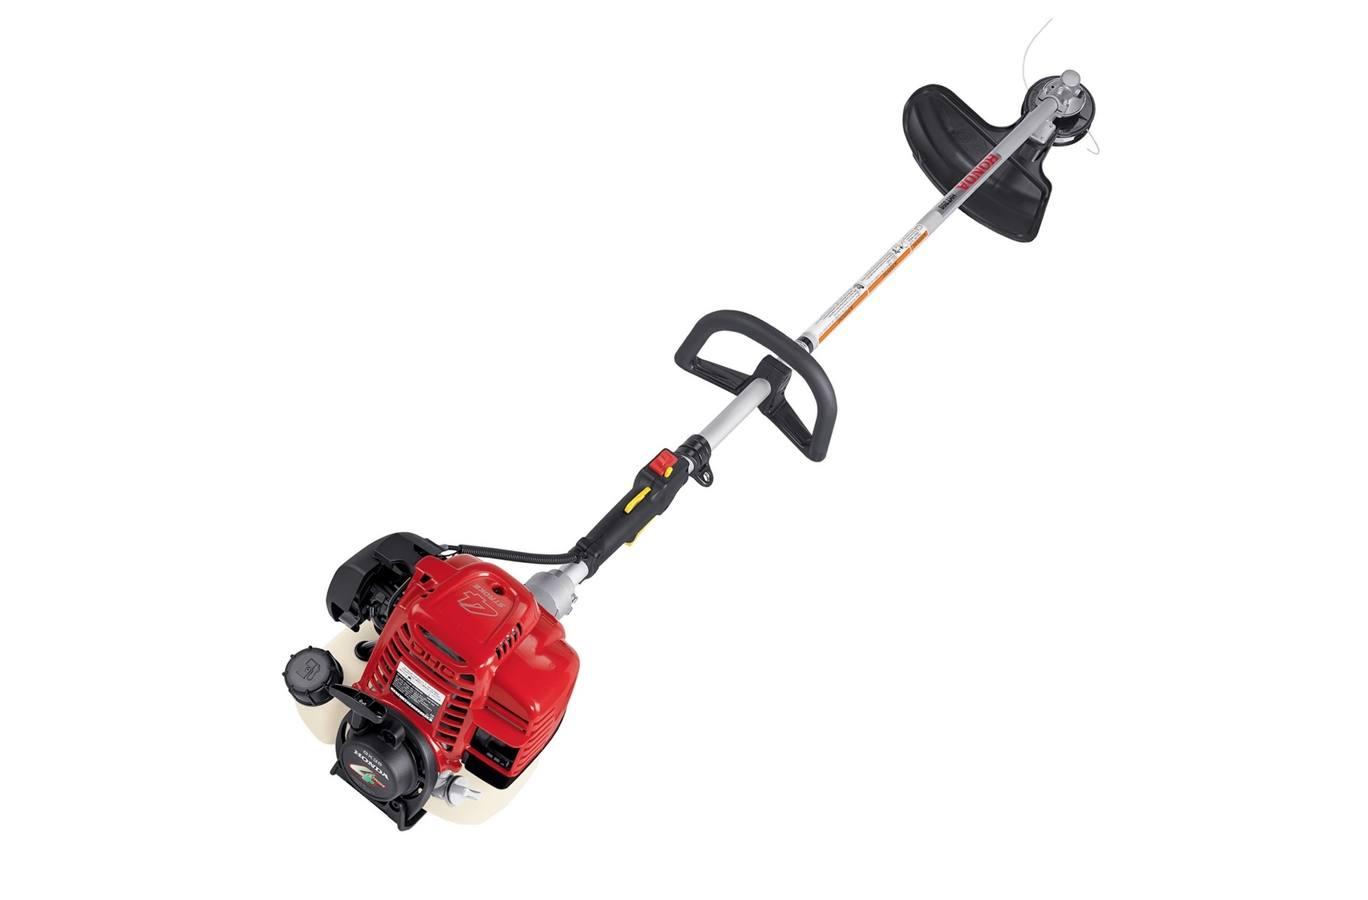 Inventory Paulson Hardware Inc Green Bay Wi 920 499 4040 Honda Lawn Mower Fuel Filter Hht35sltat